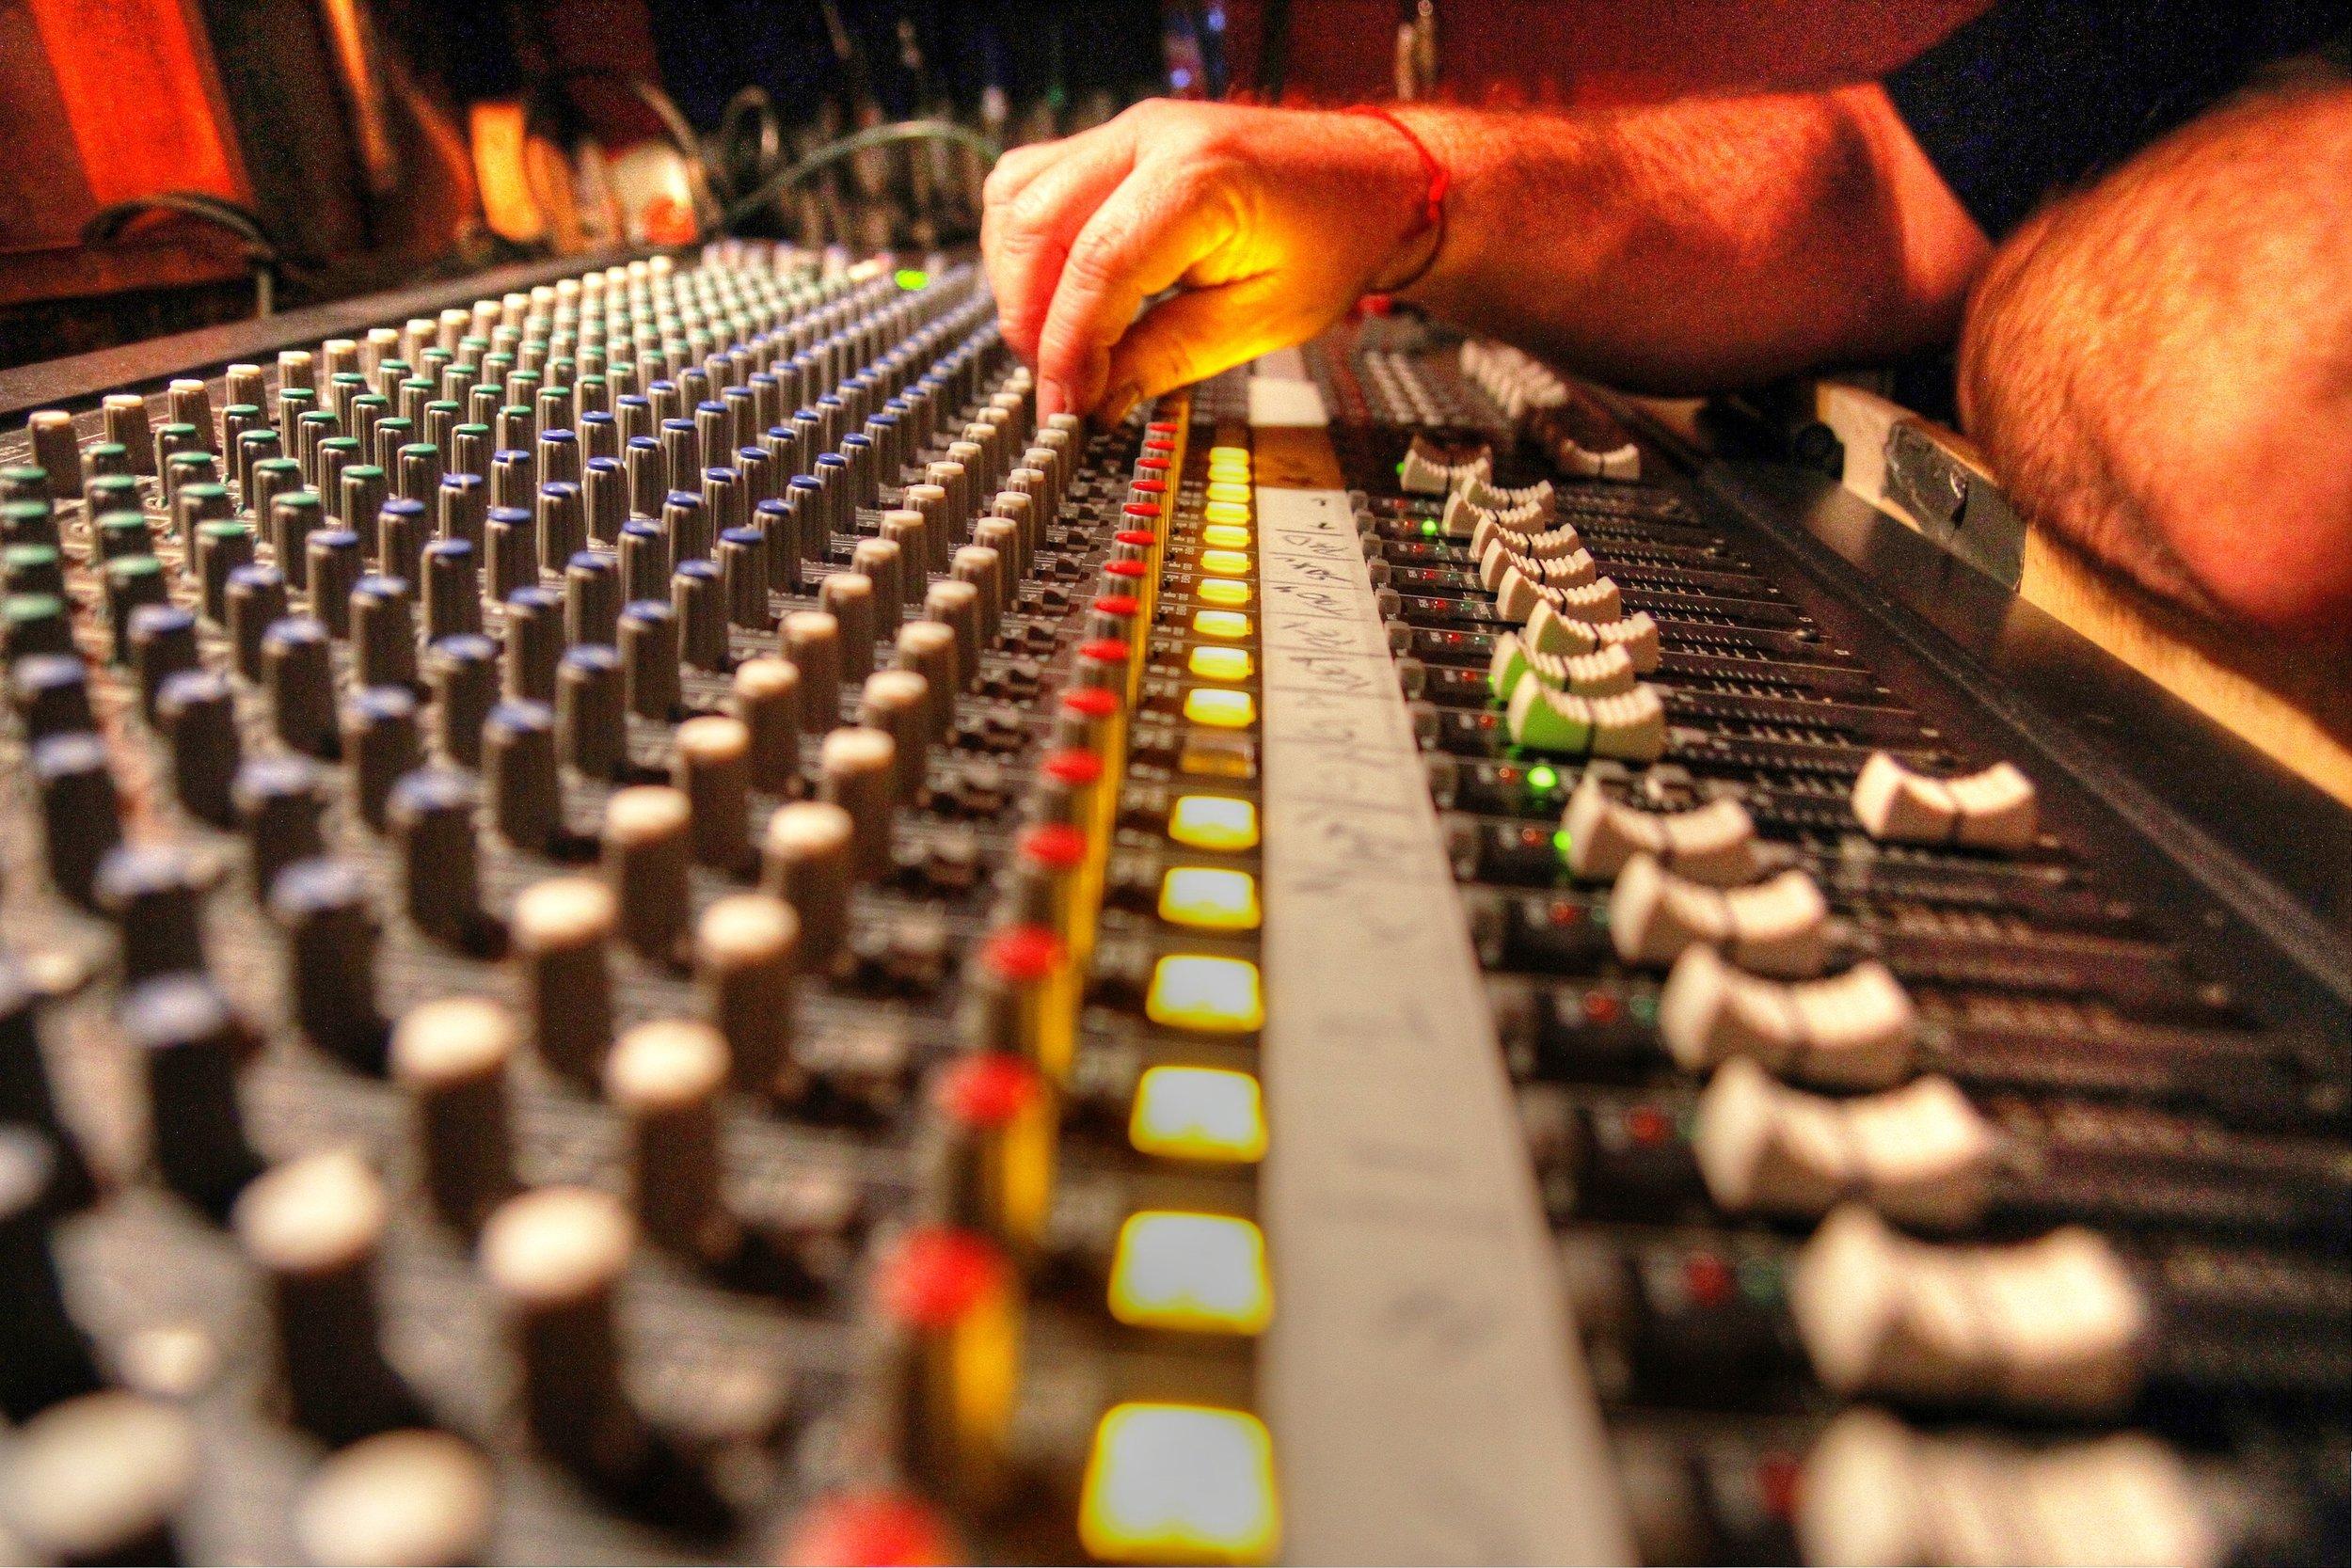 music-dj-audio-party-disk-soundboard-1066188-pxhere.com.jpg